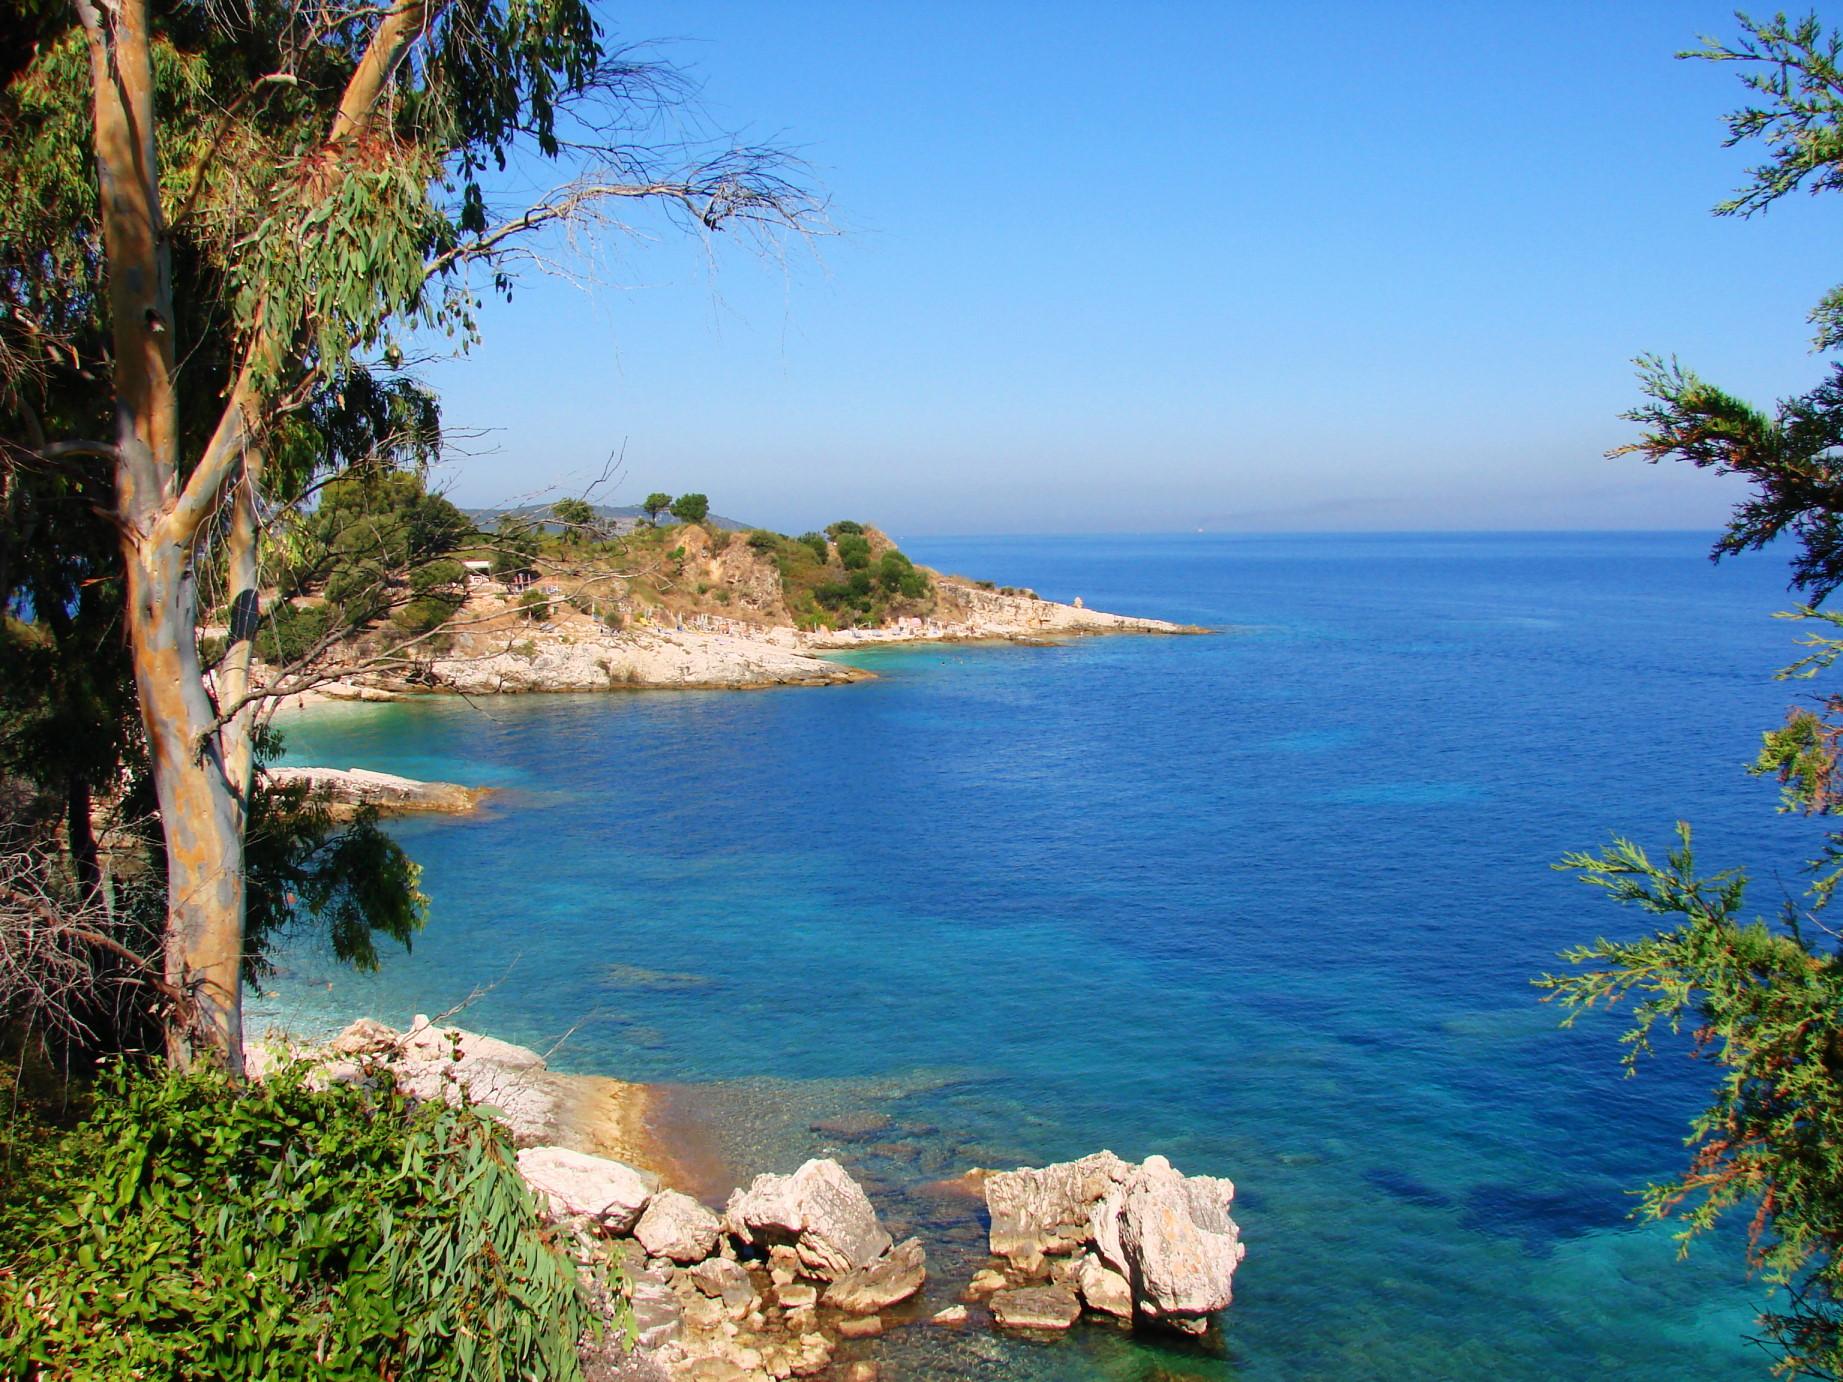 Пляж кассиопи на корфу фото